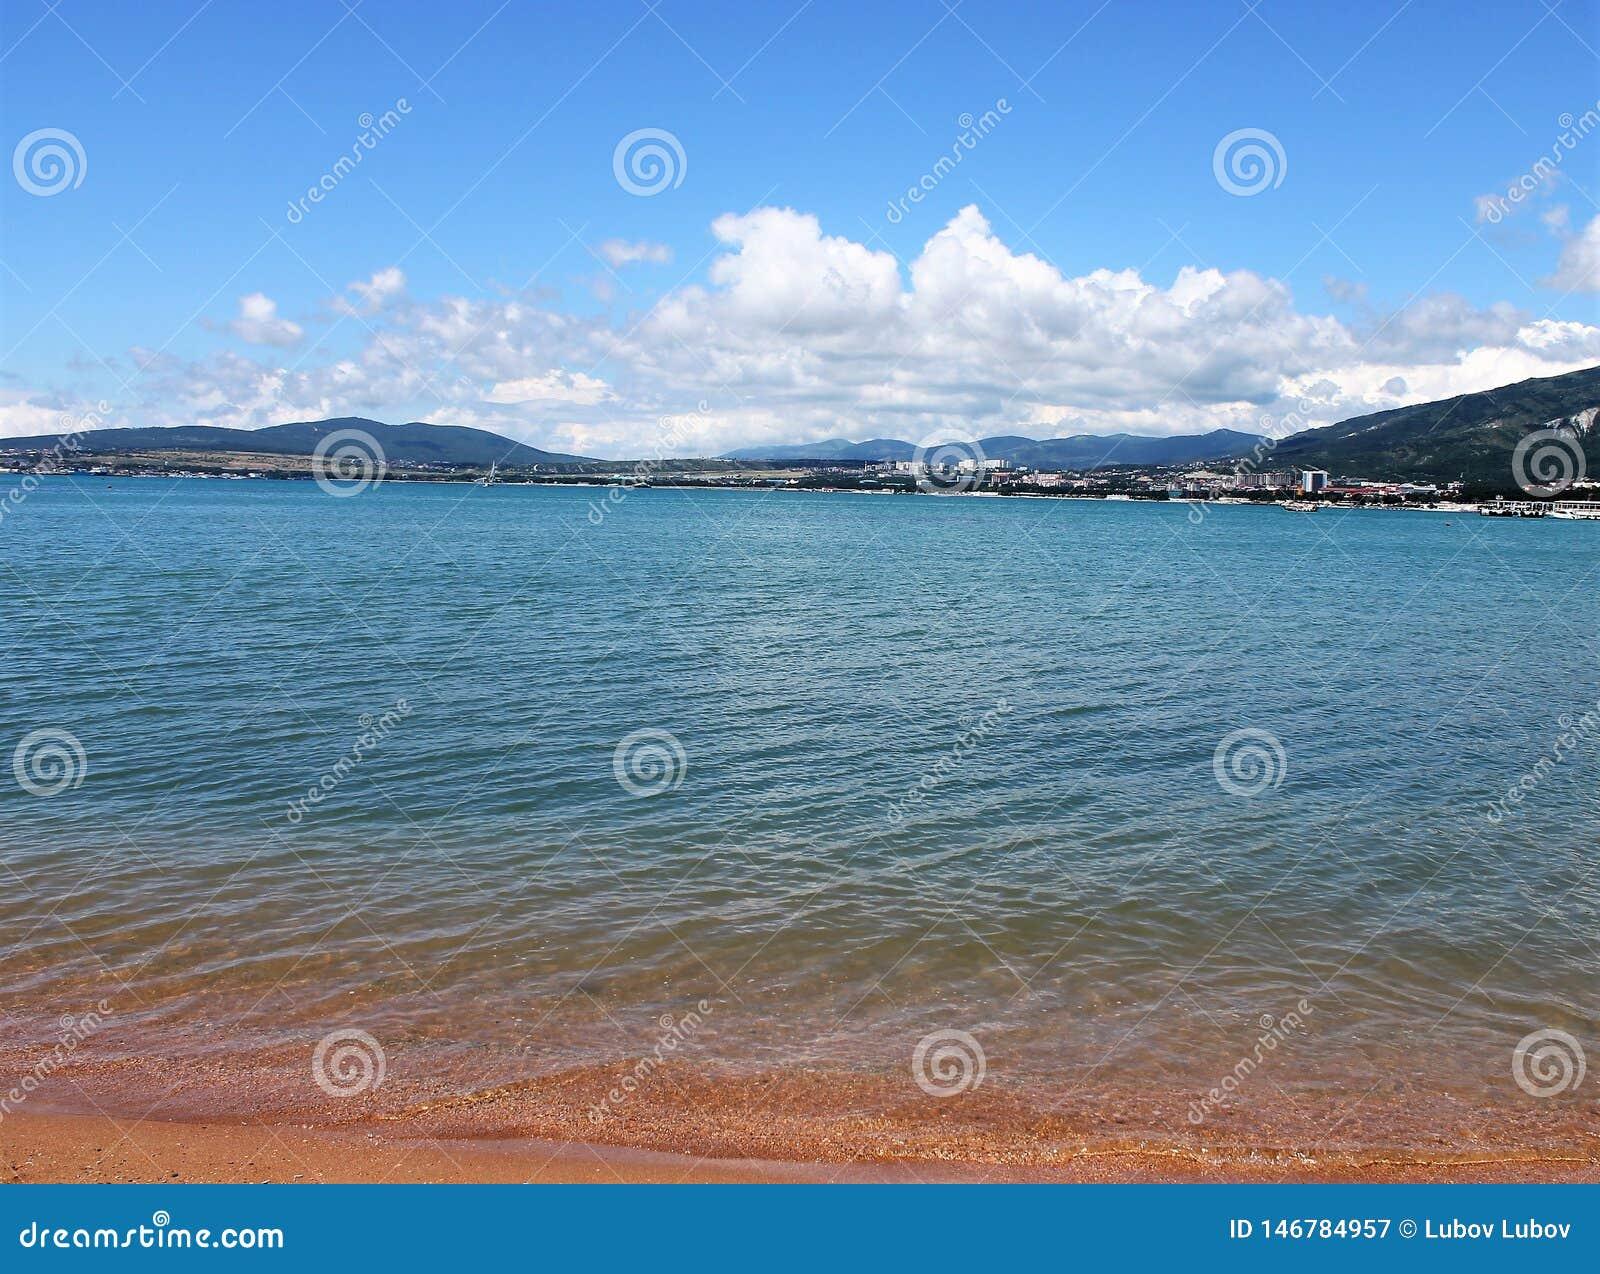 Sandy beach, wonderful sea and mountain views.